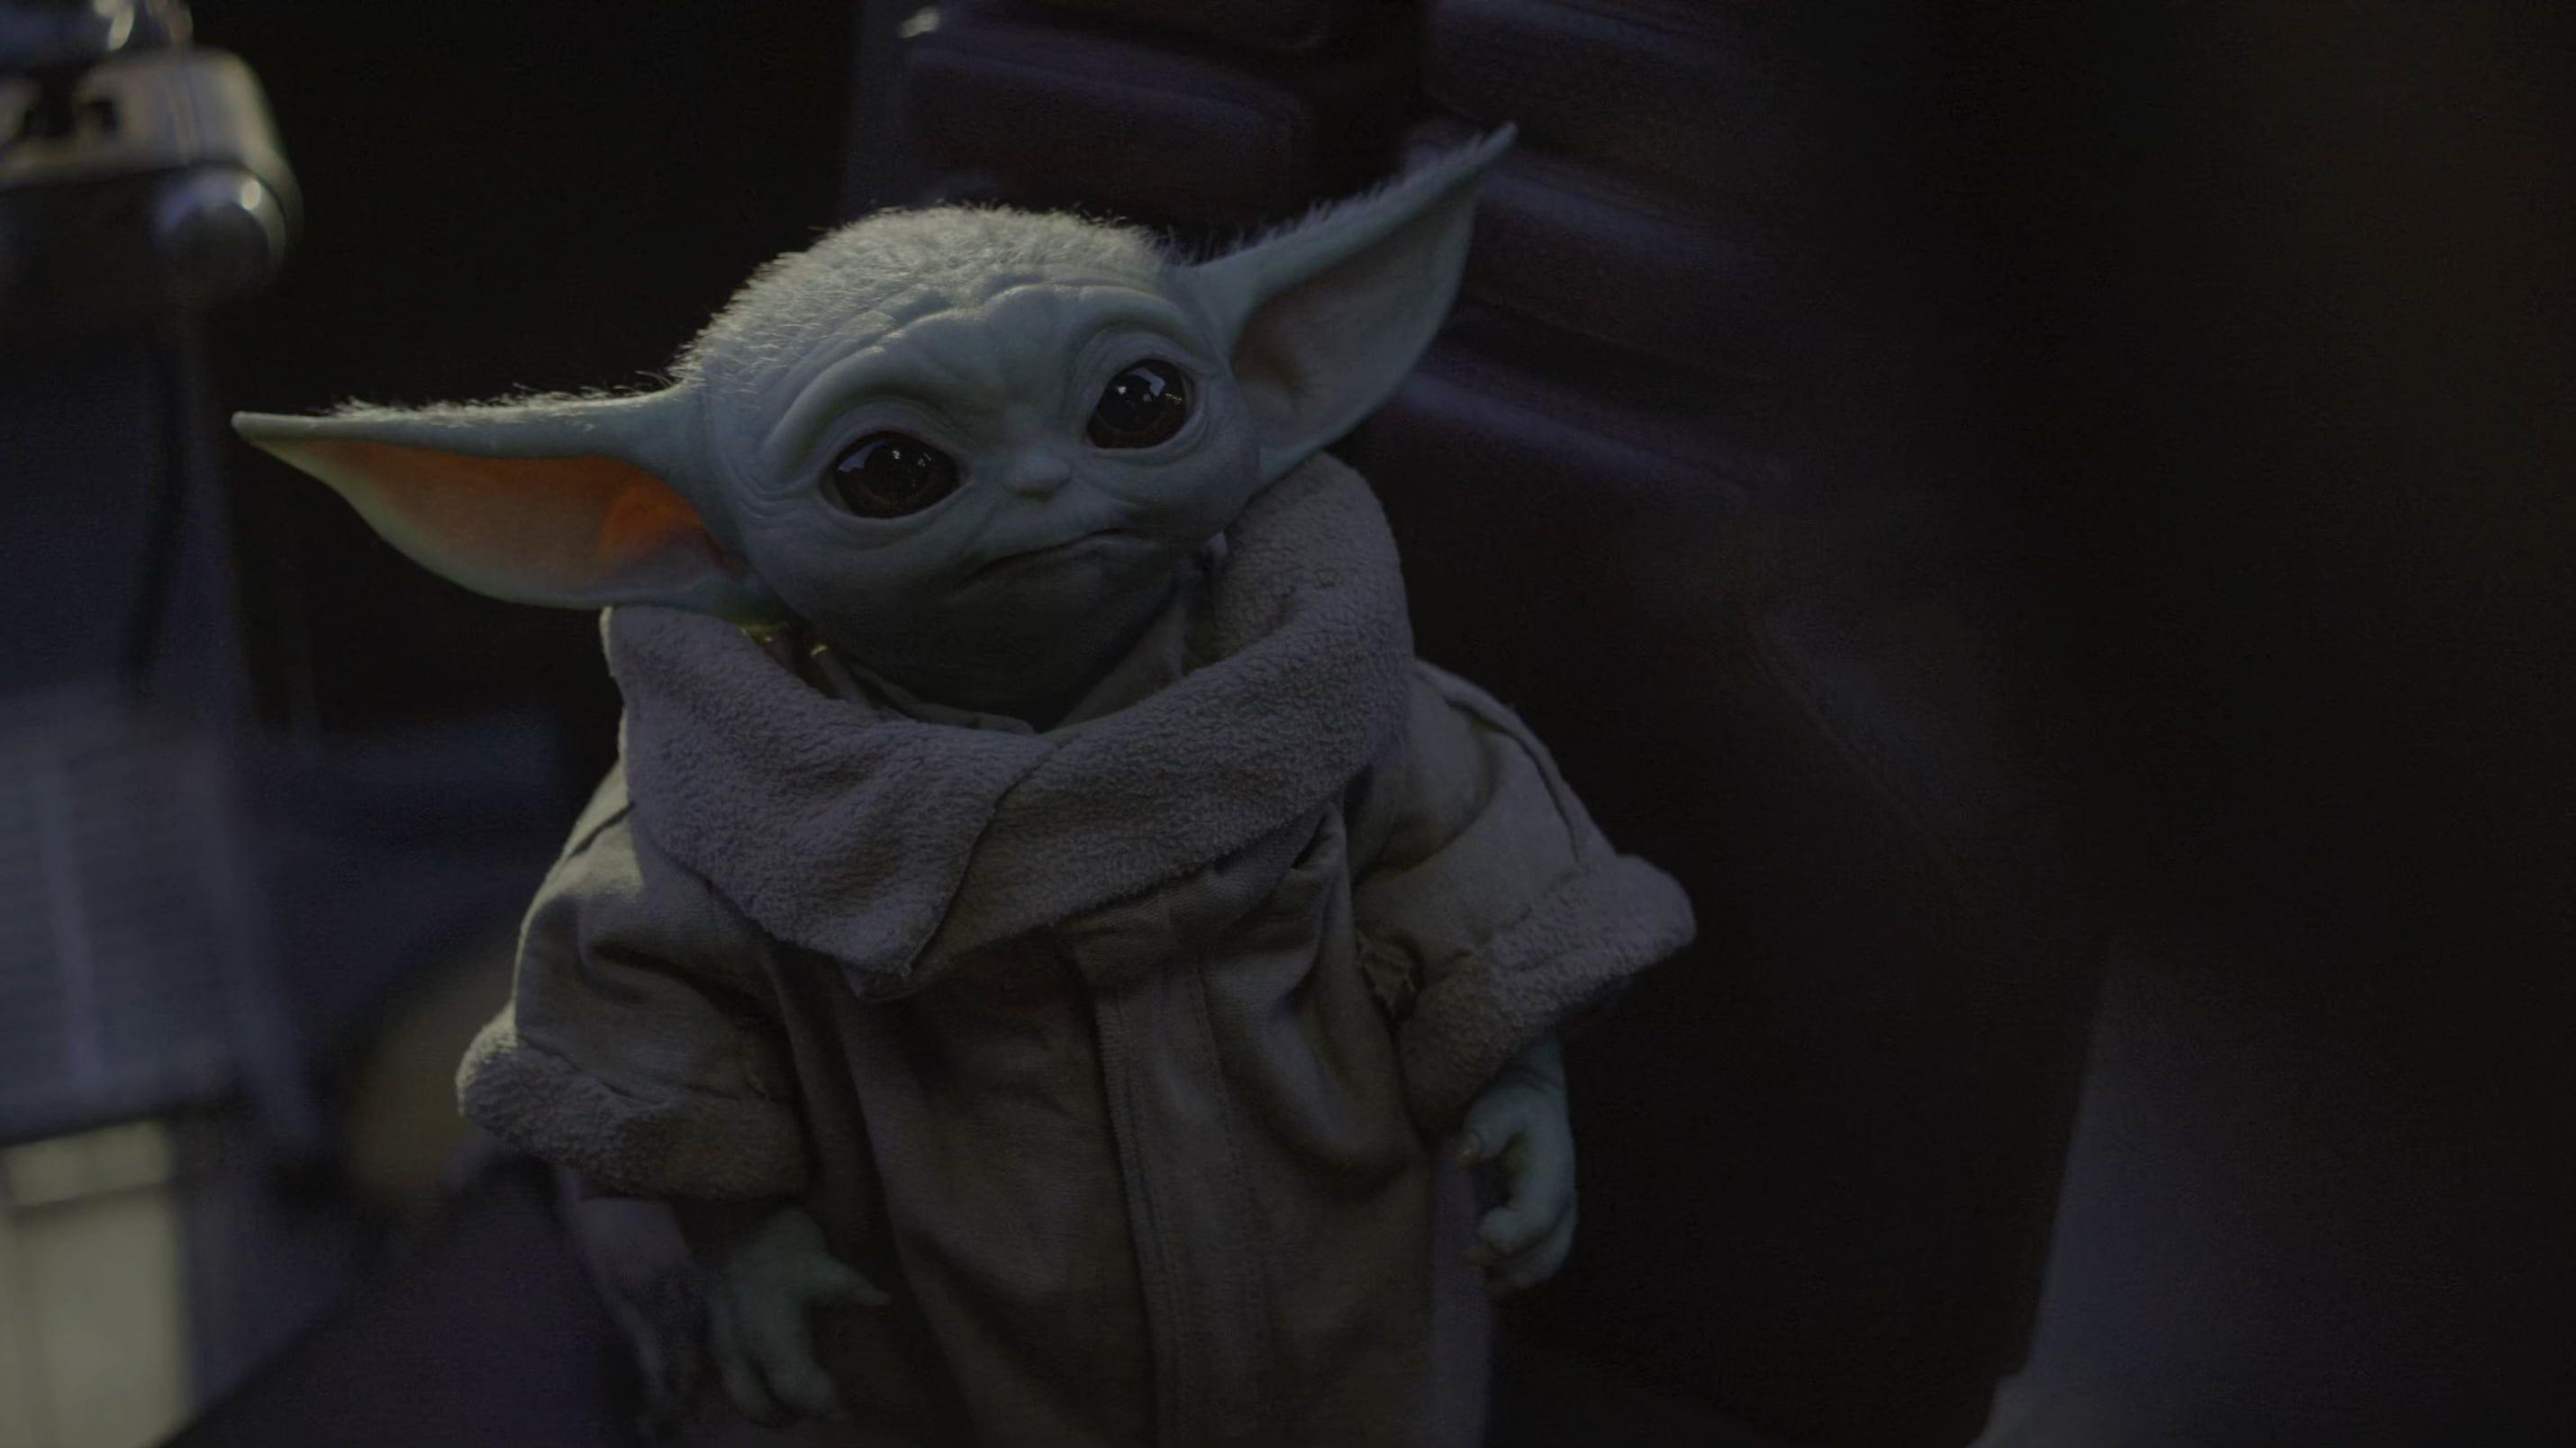 The Mandalorian Baby Yoda 2k Wallpaper Hdwallpaper Desktop Star Wars Yoda Star Wars Memes Star Wars Humor